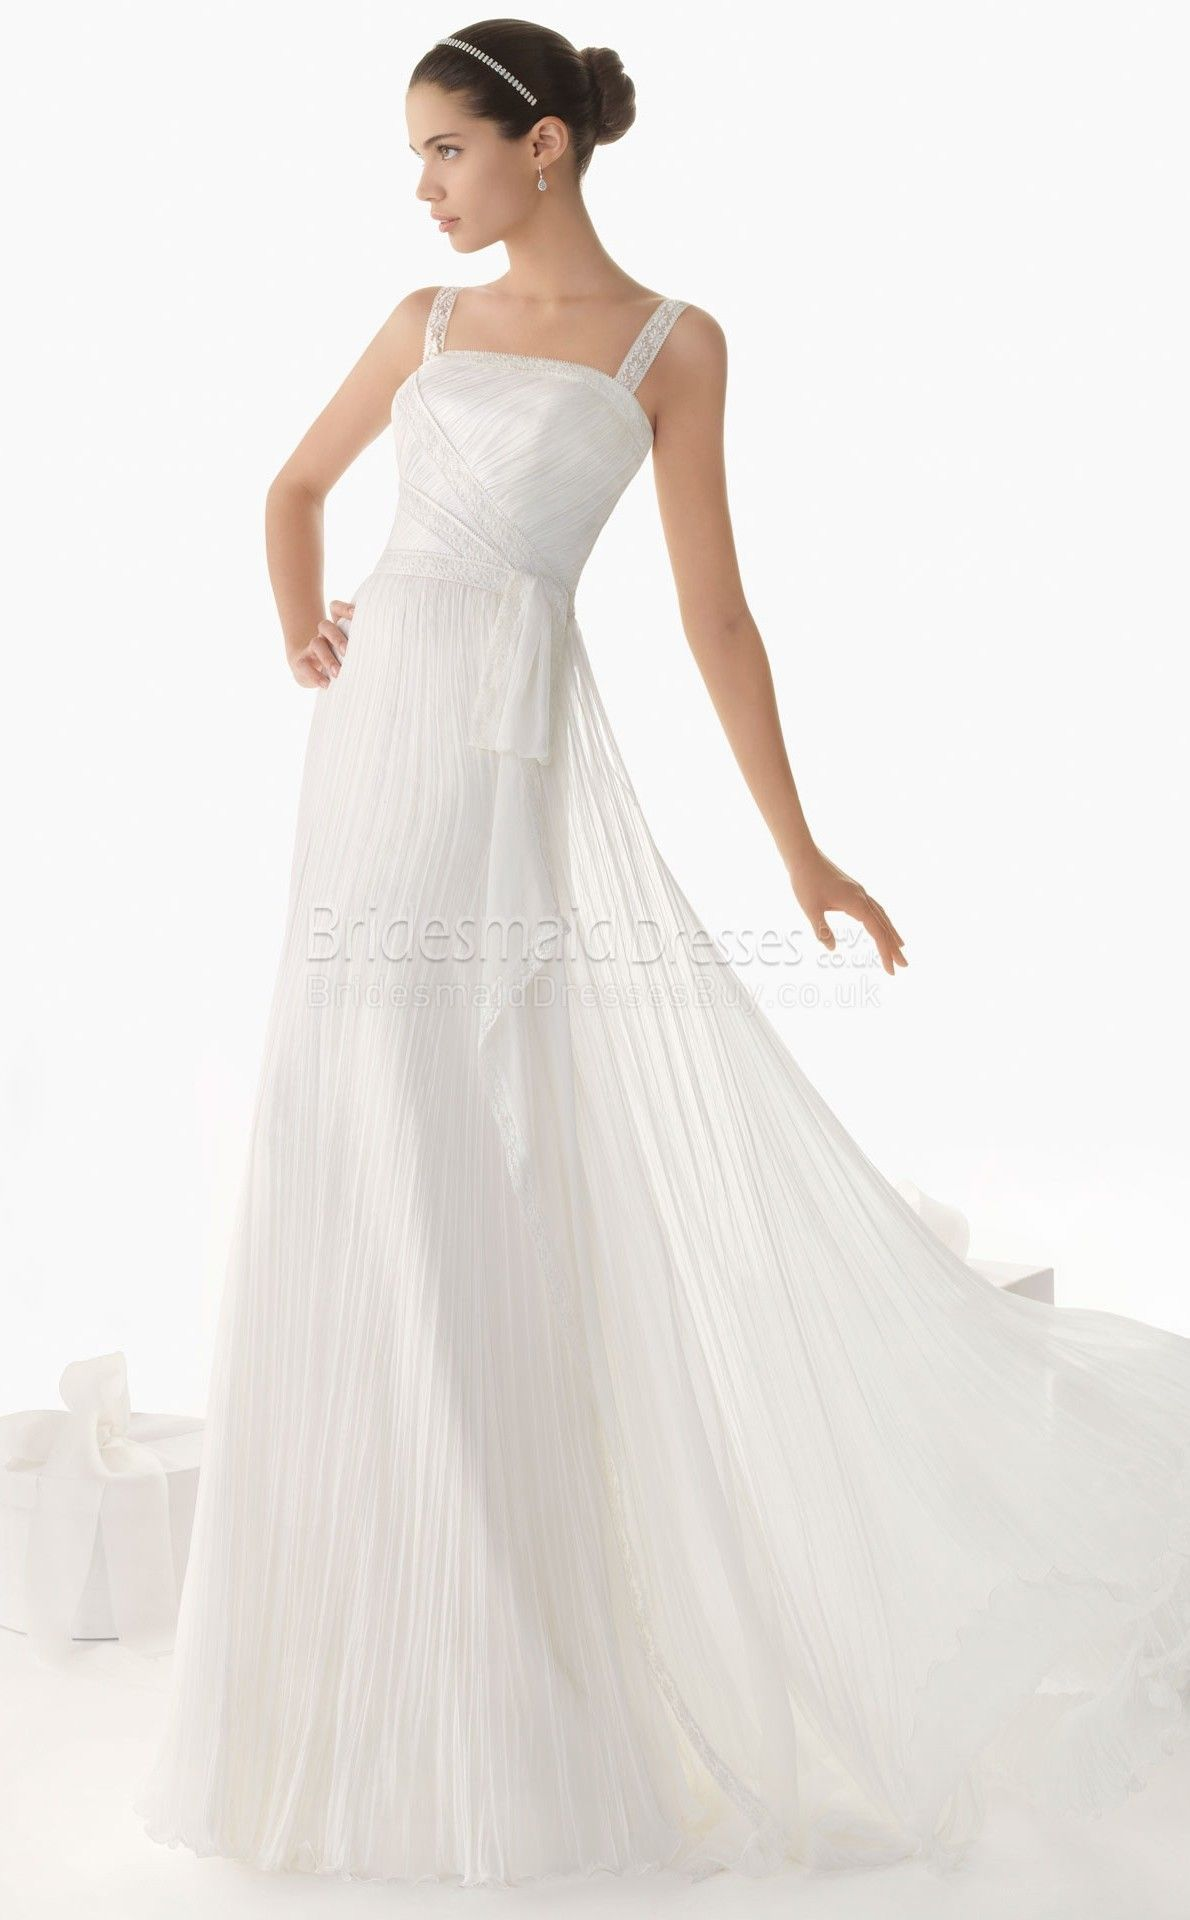 Beach dresses for weddings  beach wedding dressessimple wedding dresses  Same husband